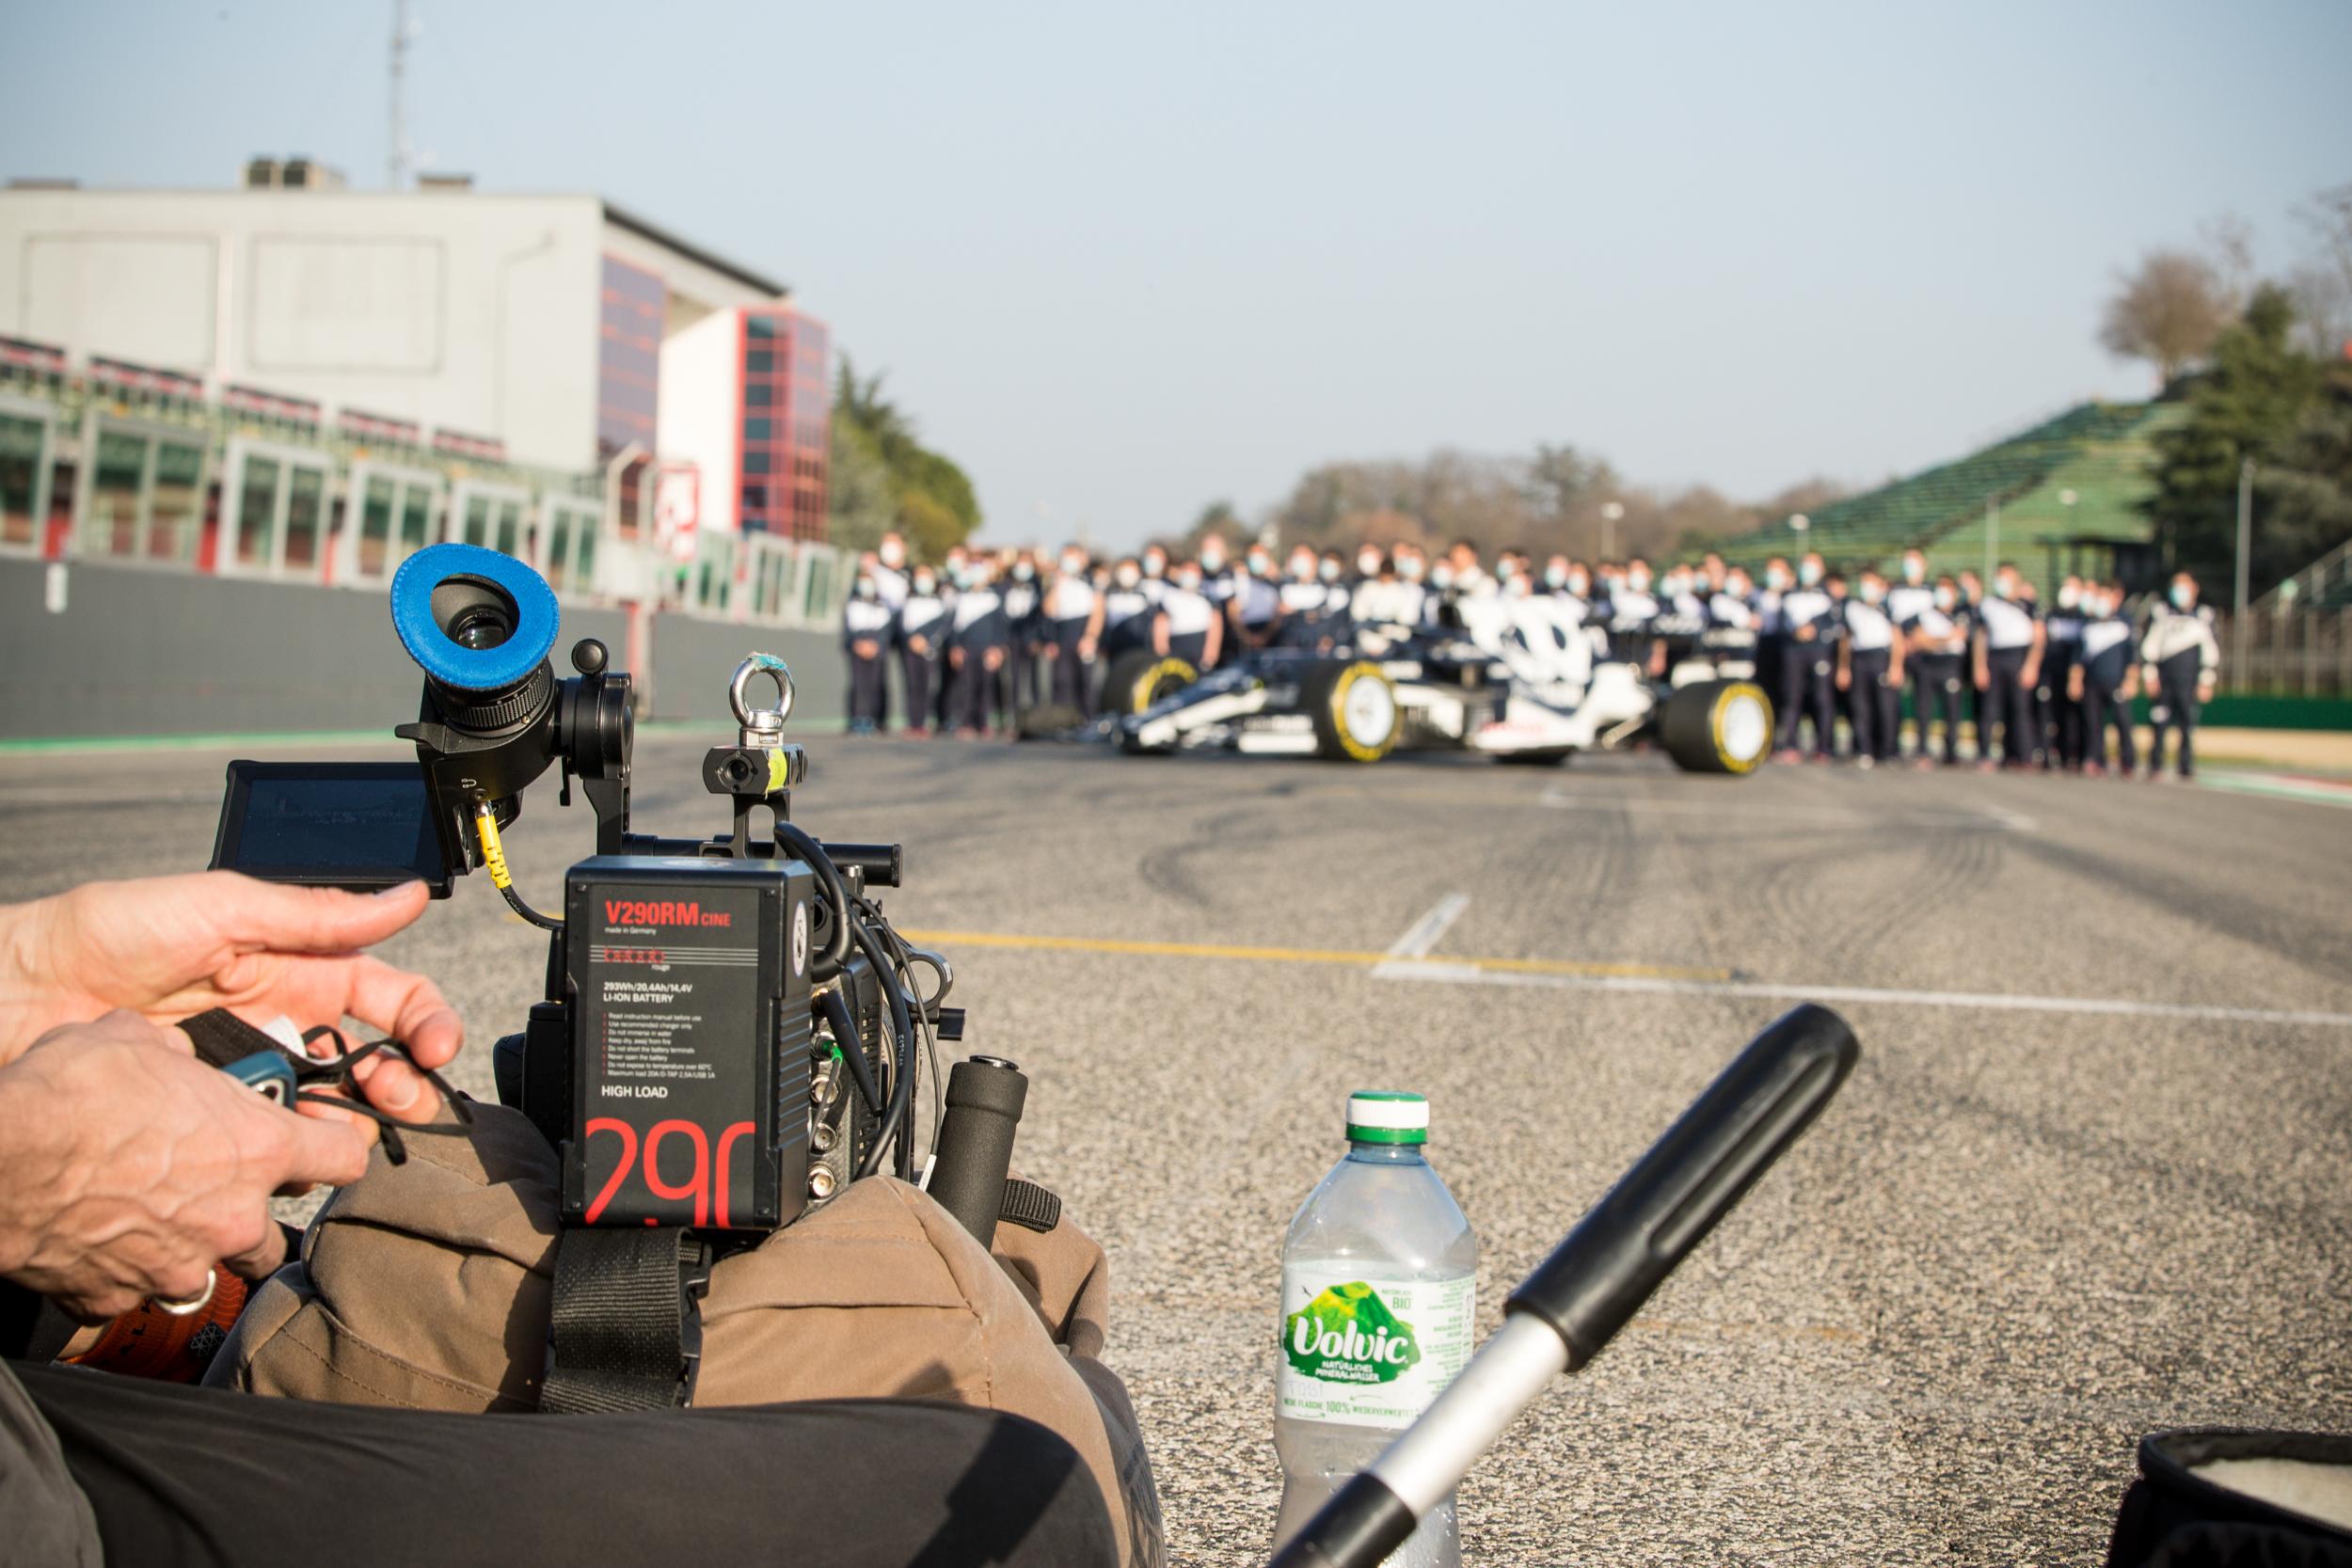 Tobi setting up the Arri Alexa - Alpha Tauri F1 Shakedown 2021